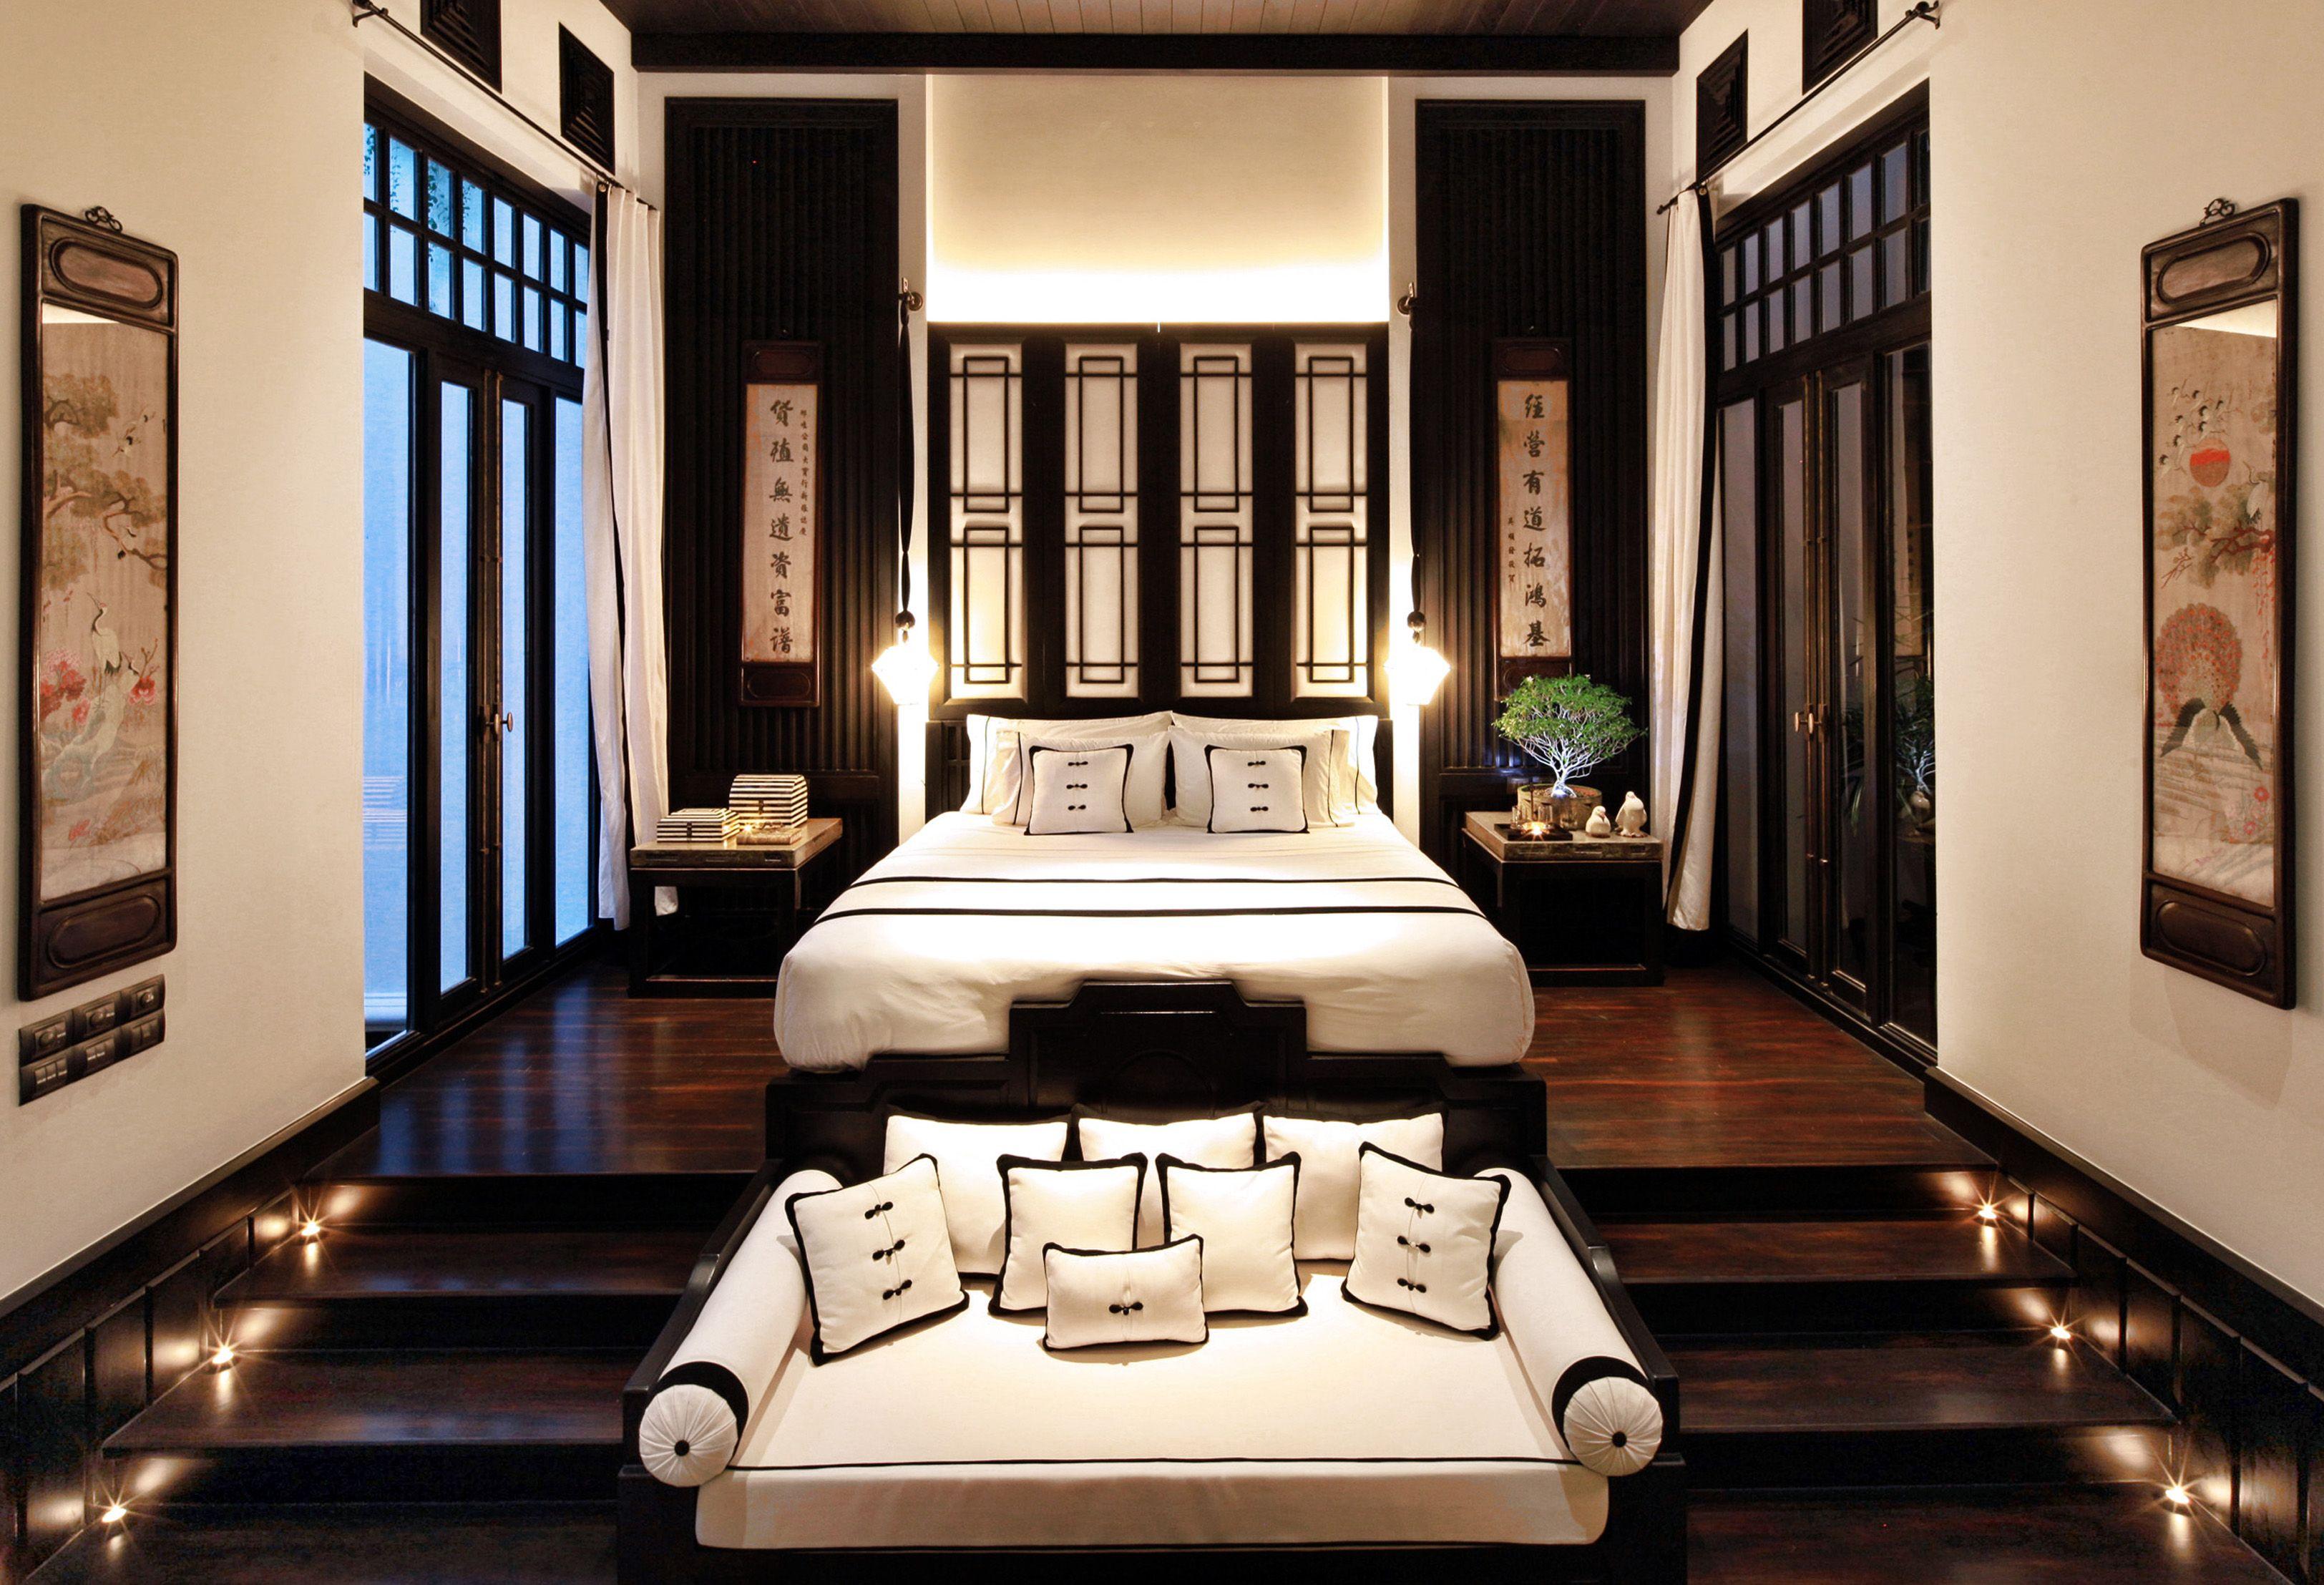 THE SIAM HOTEL BANGKOK THIALAND Designed by BENSLEY